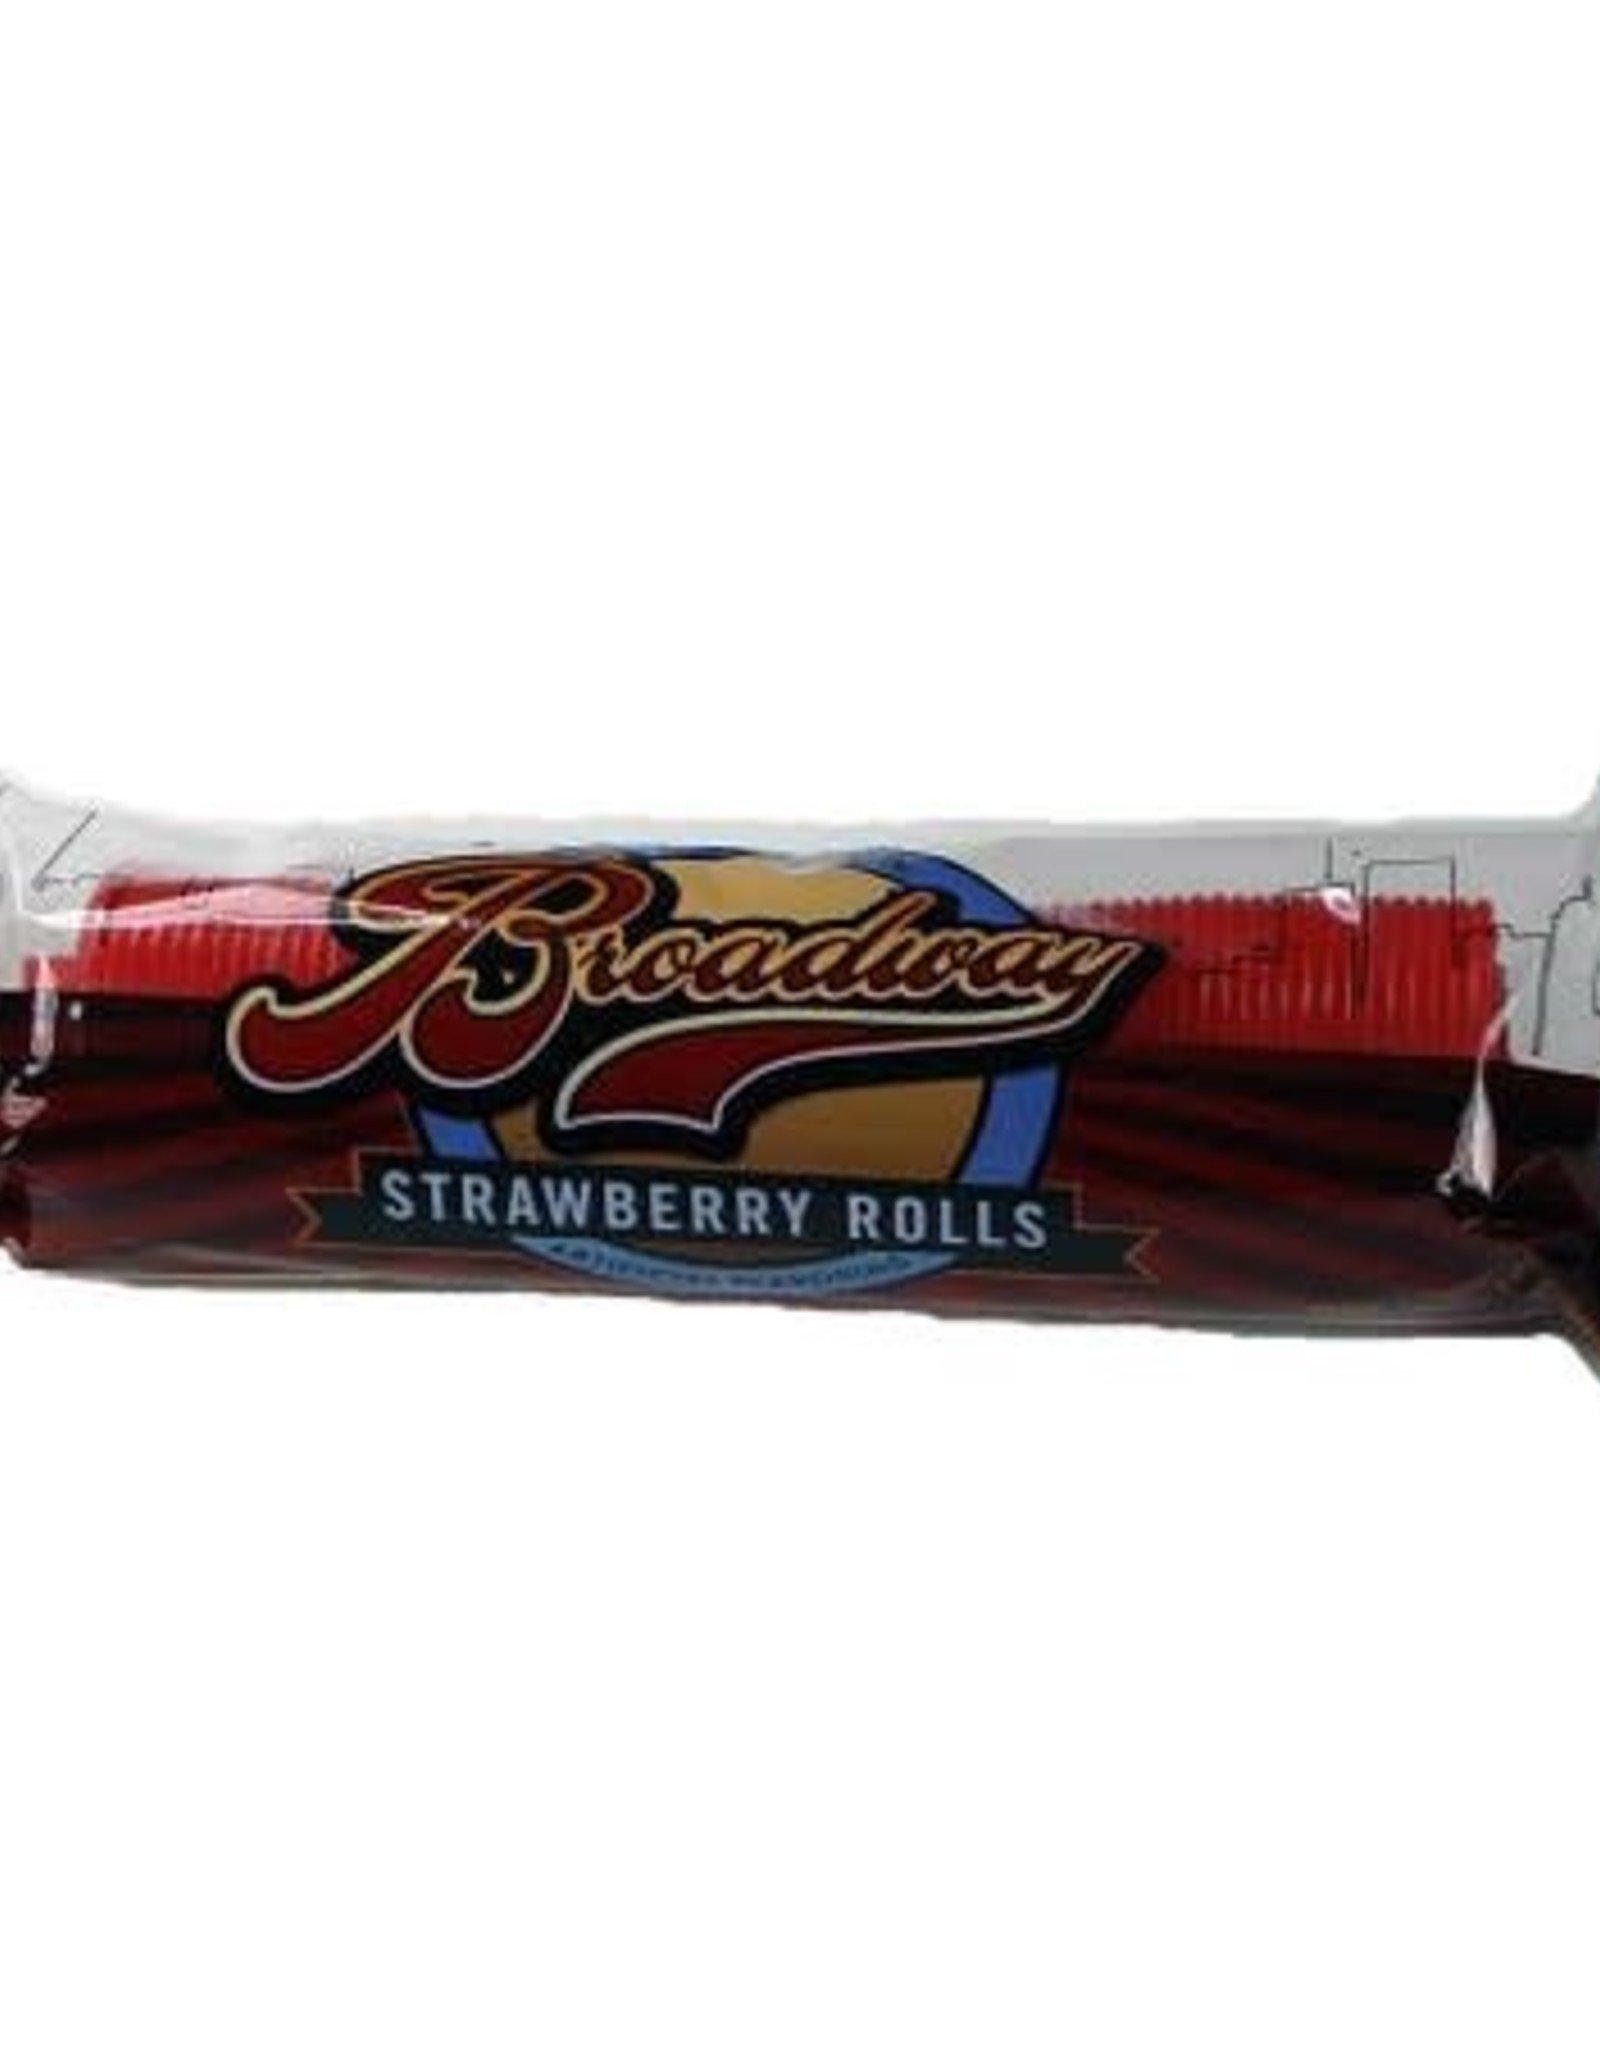 Miscellaneous Broadway Strawberry Licorice Rolls